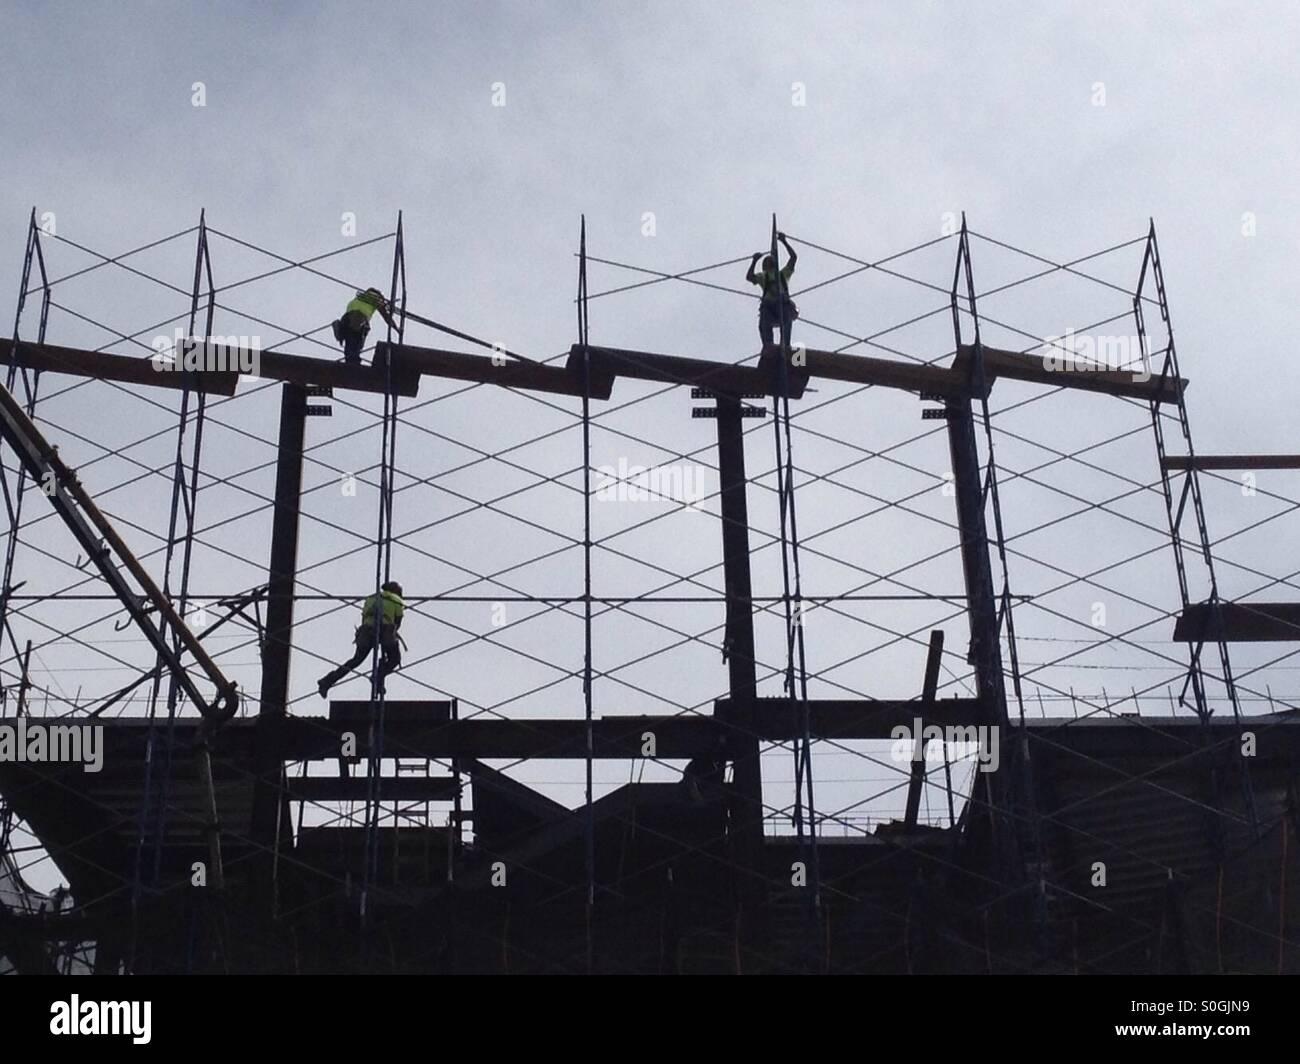 New York Scaffolding Workers Stock Photos & New York Scaffolding ...